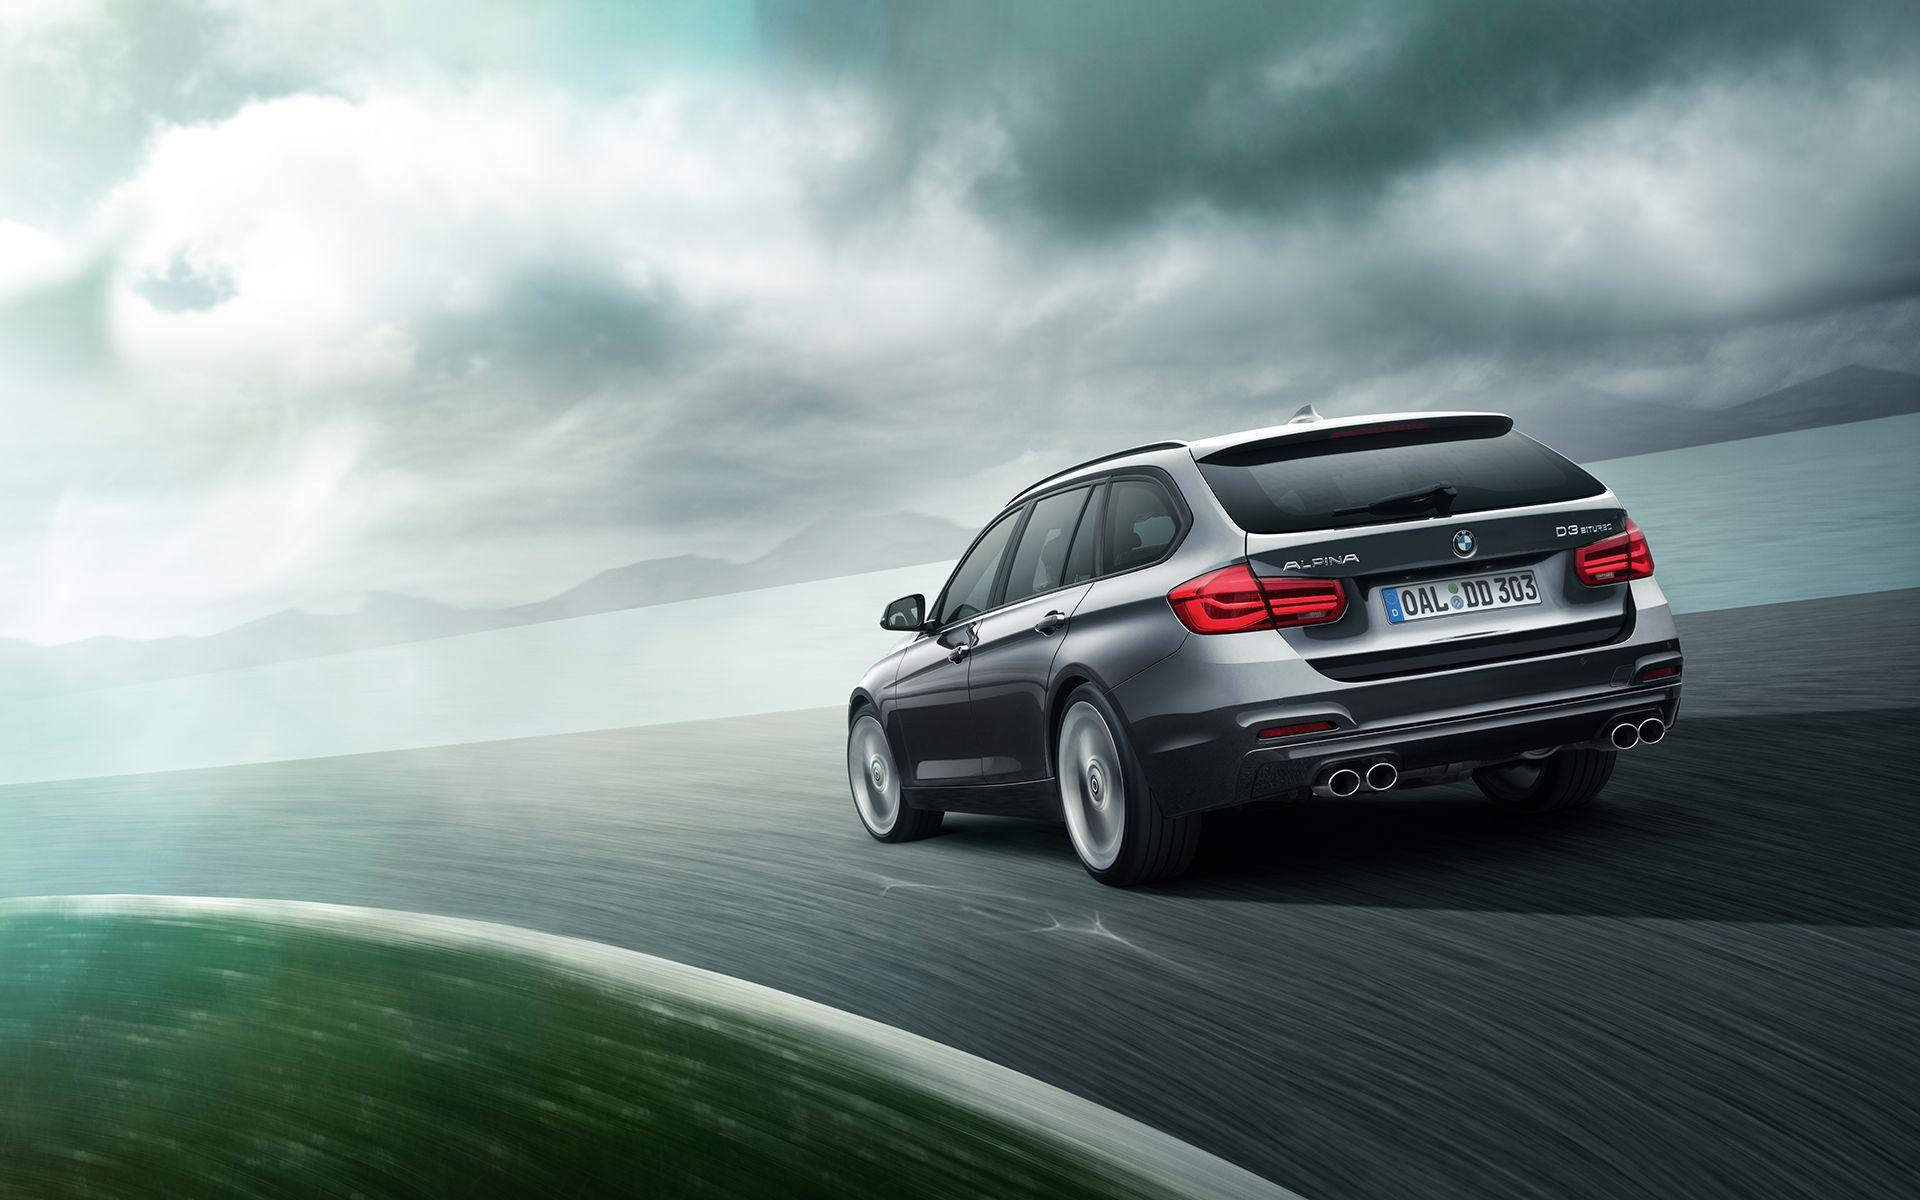 #BMW #F30 #F31 #D3 #Sedan #Touring #ALPiNA #BiTURBO #Facelift